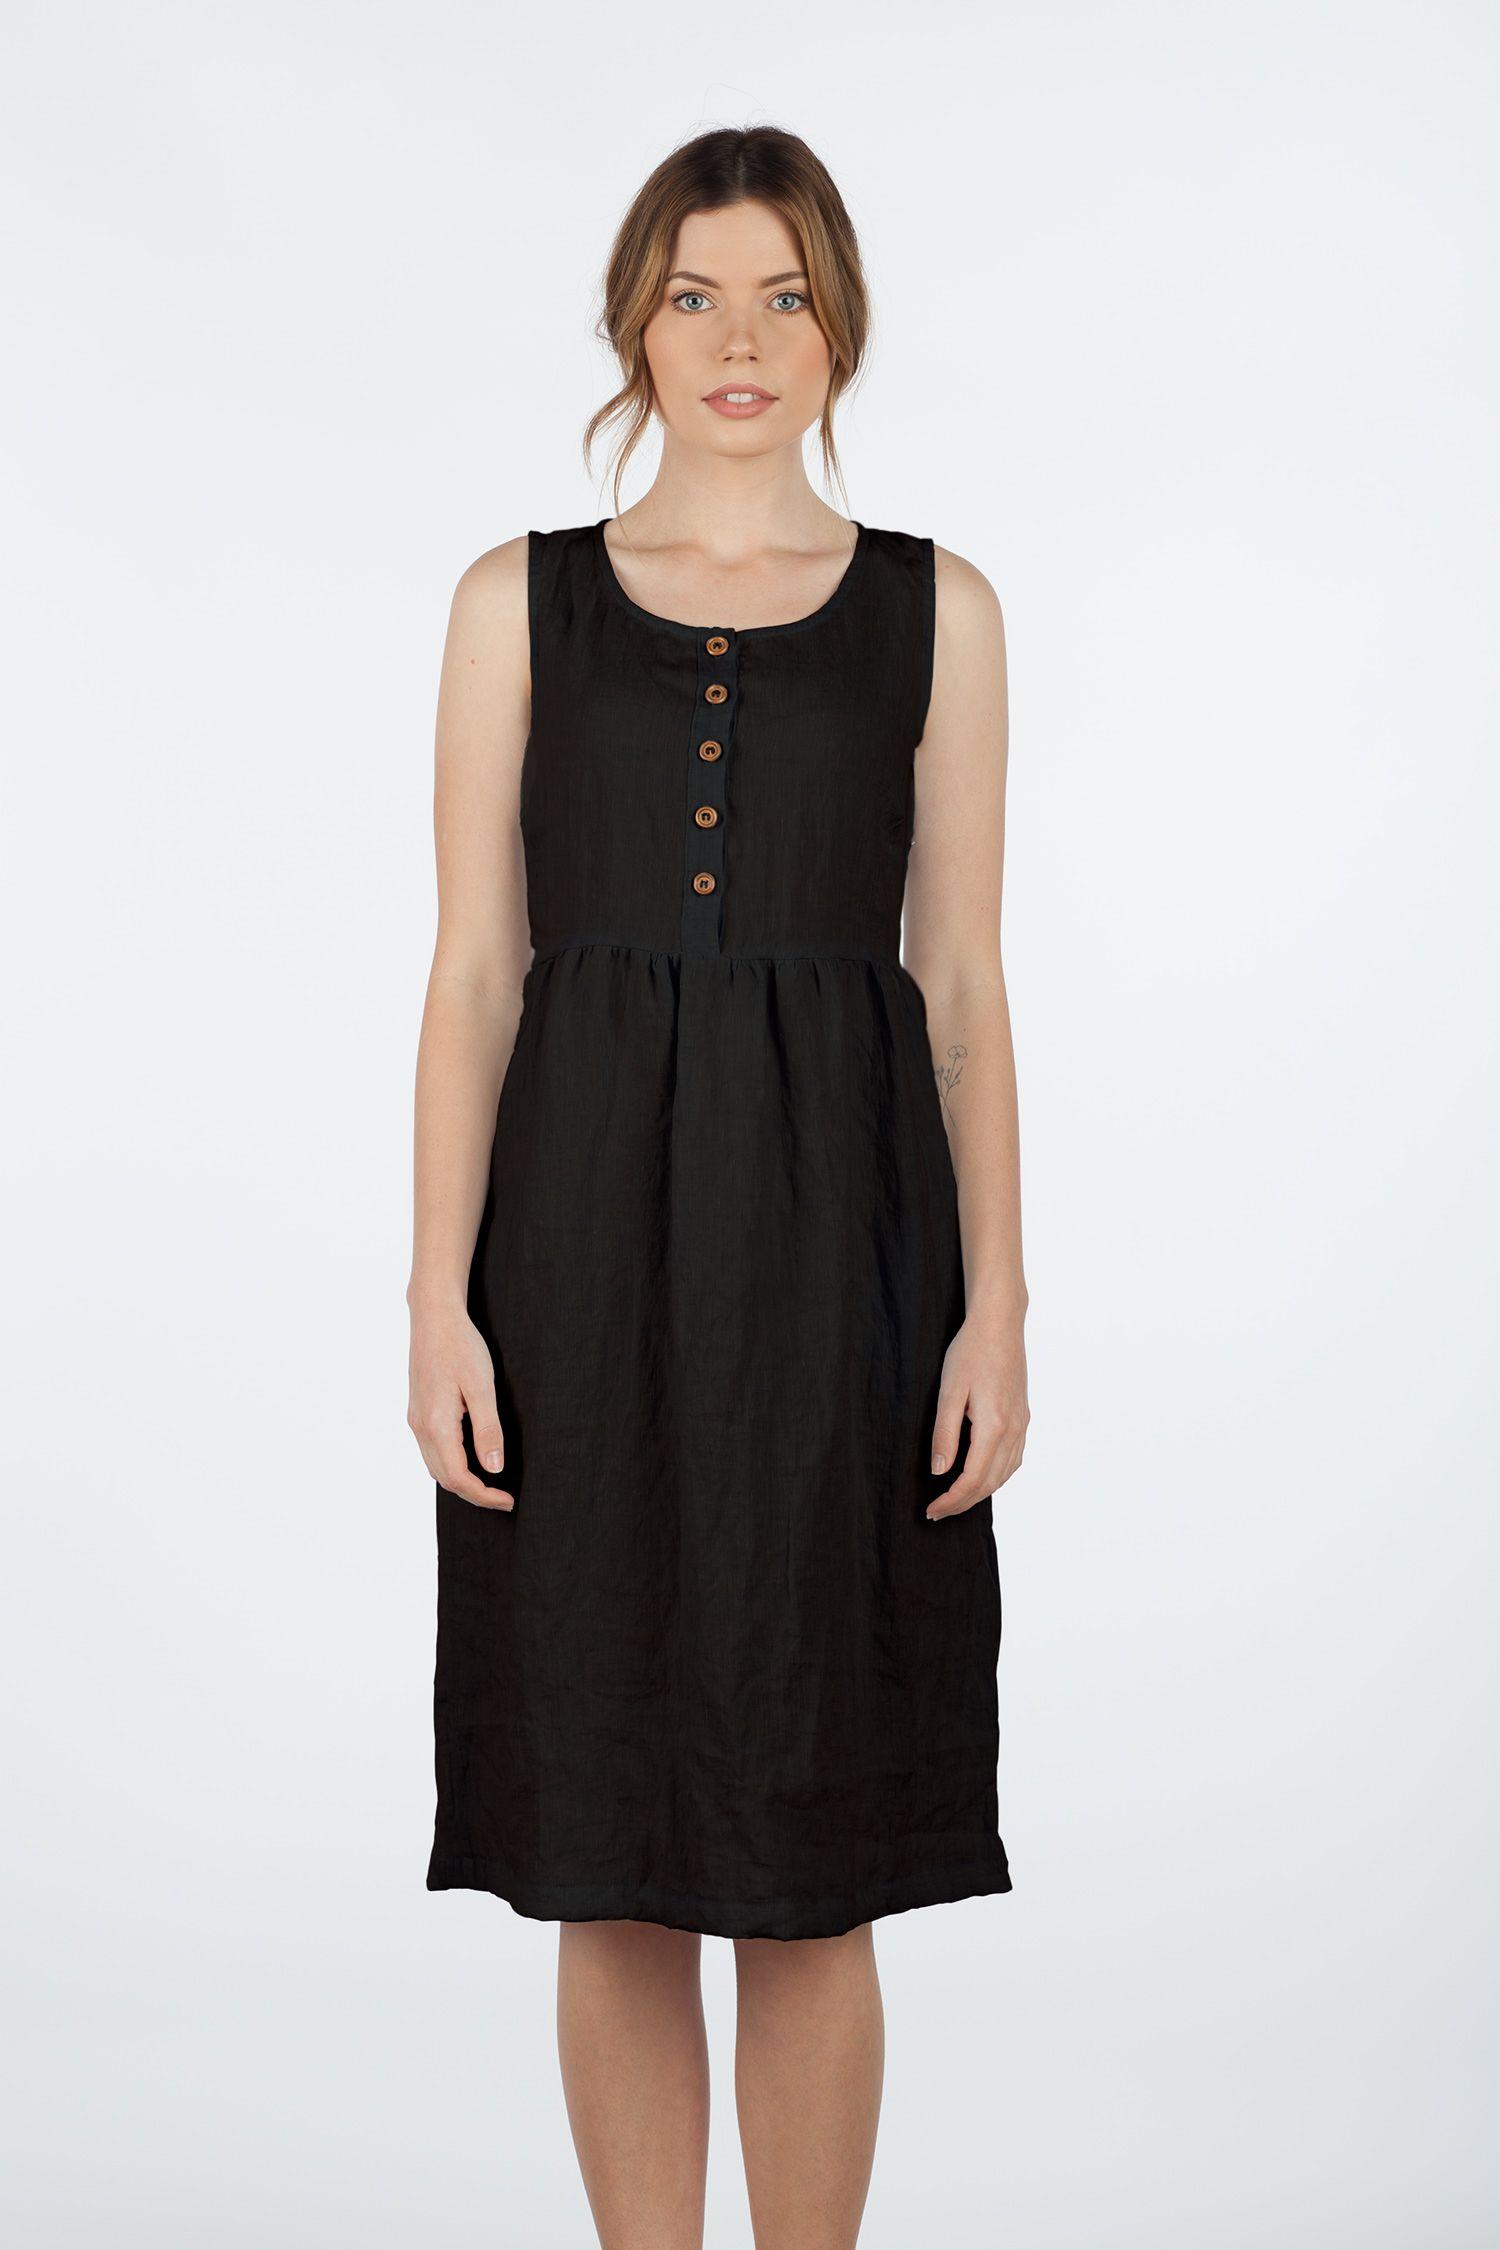 Model No 24 Black Linen Sleeveless Button Up Midi Length Dress Pyne Smith Clothiers Sleeveless Linen Dress Midi Length Dress Linen Shift Dress [ 2250 x 1500 Pixel ]